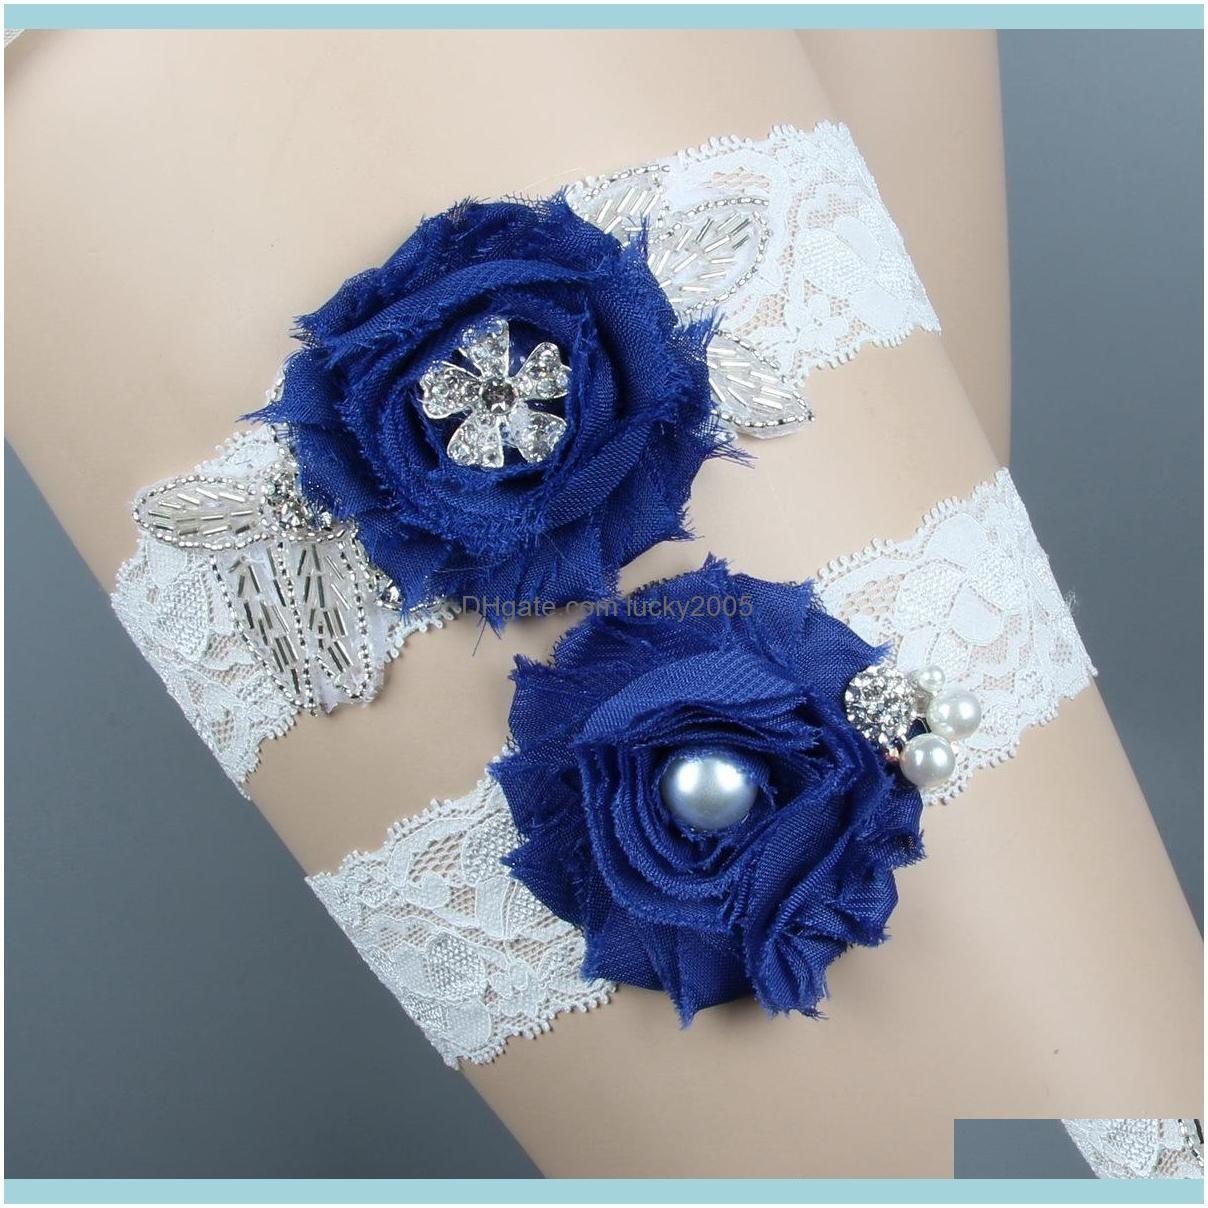 royal blue wedding garters set for bride bridal garters chiffon handmade flower rhinestones vintage prom gift 2019 cheap in stock